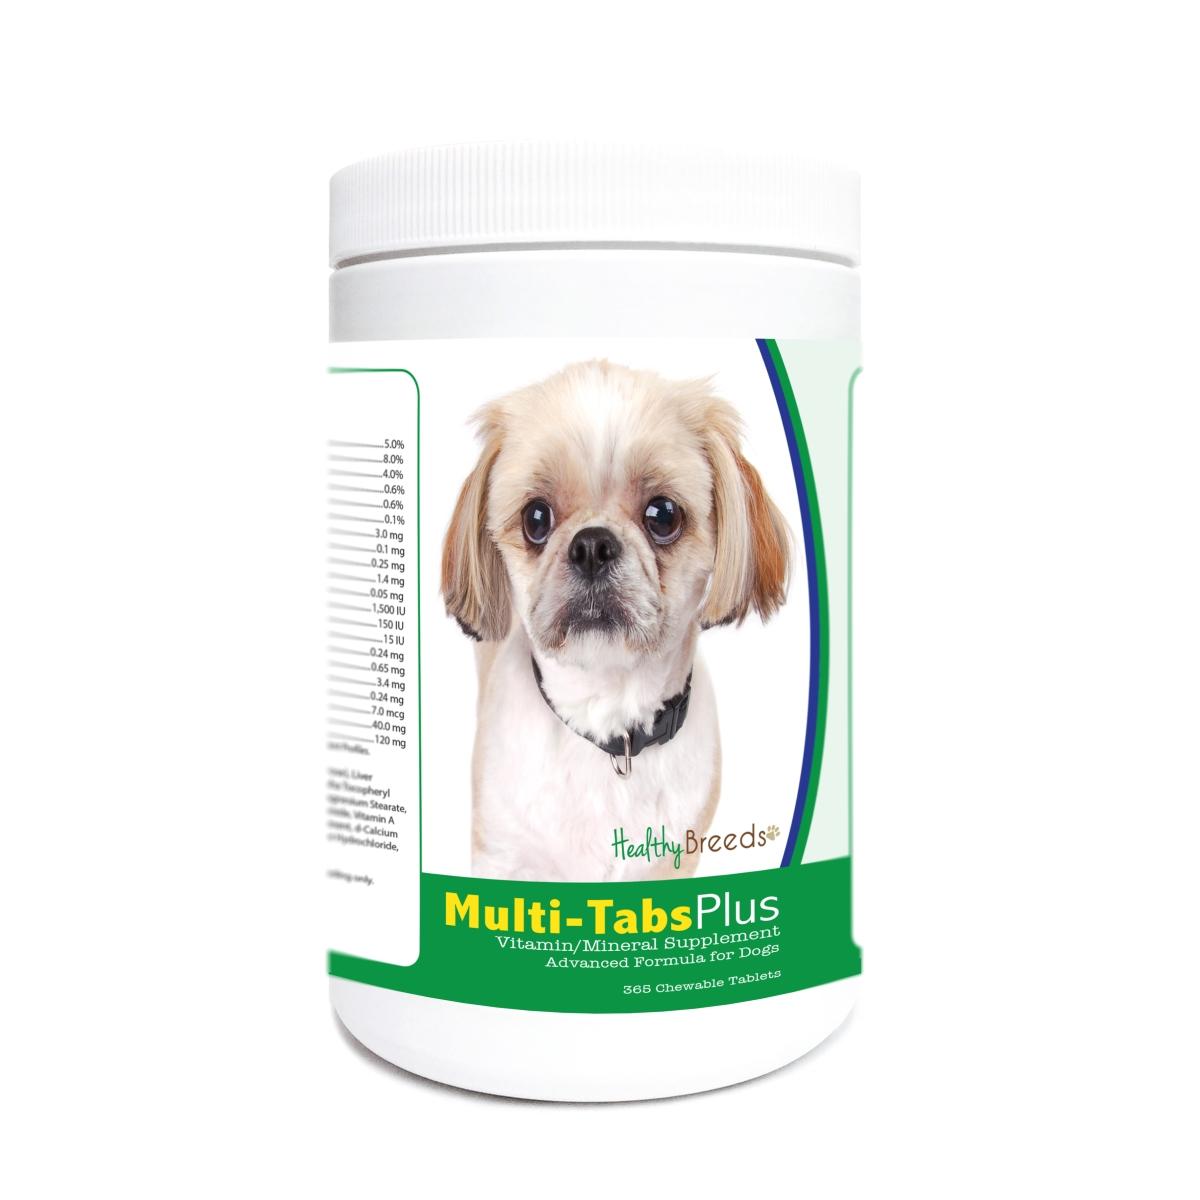 Healthy Breeds 840235176152 Peekapoo Multi-Tabs Plus Chewable Tablets - 365 Count